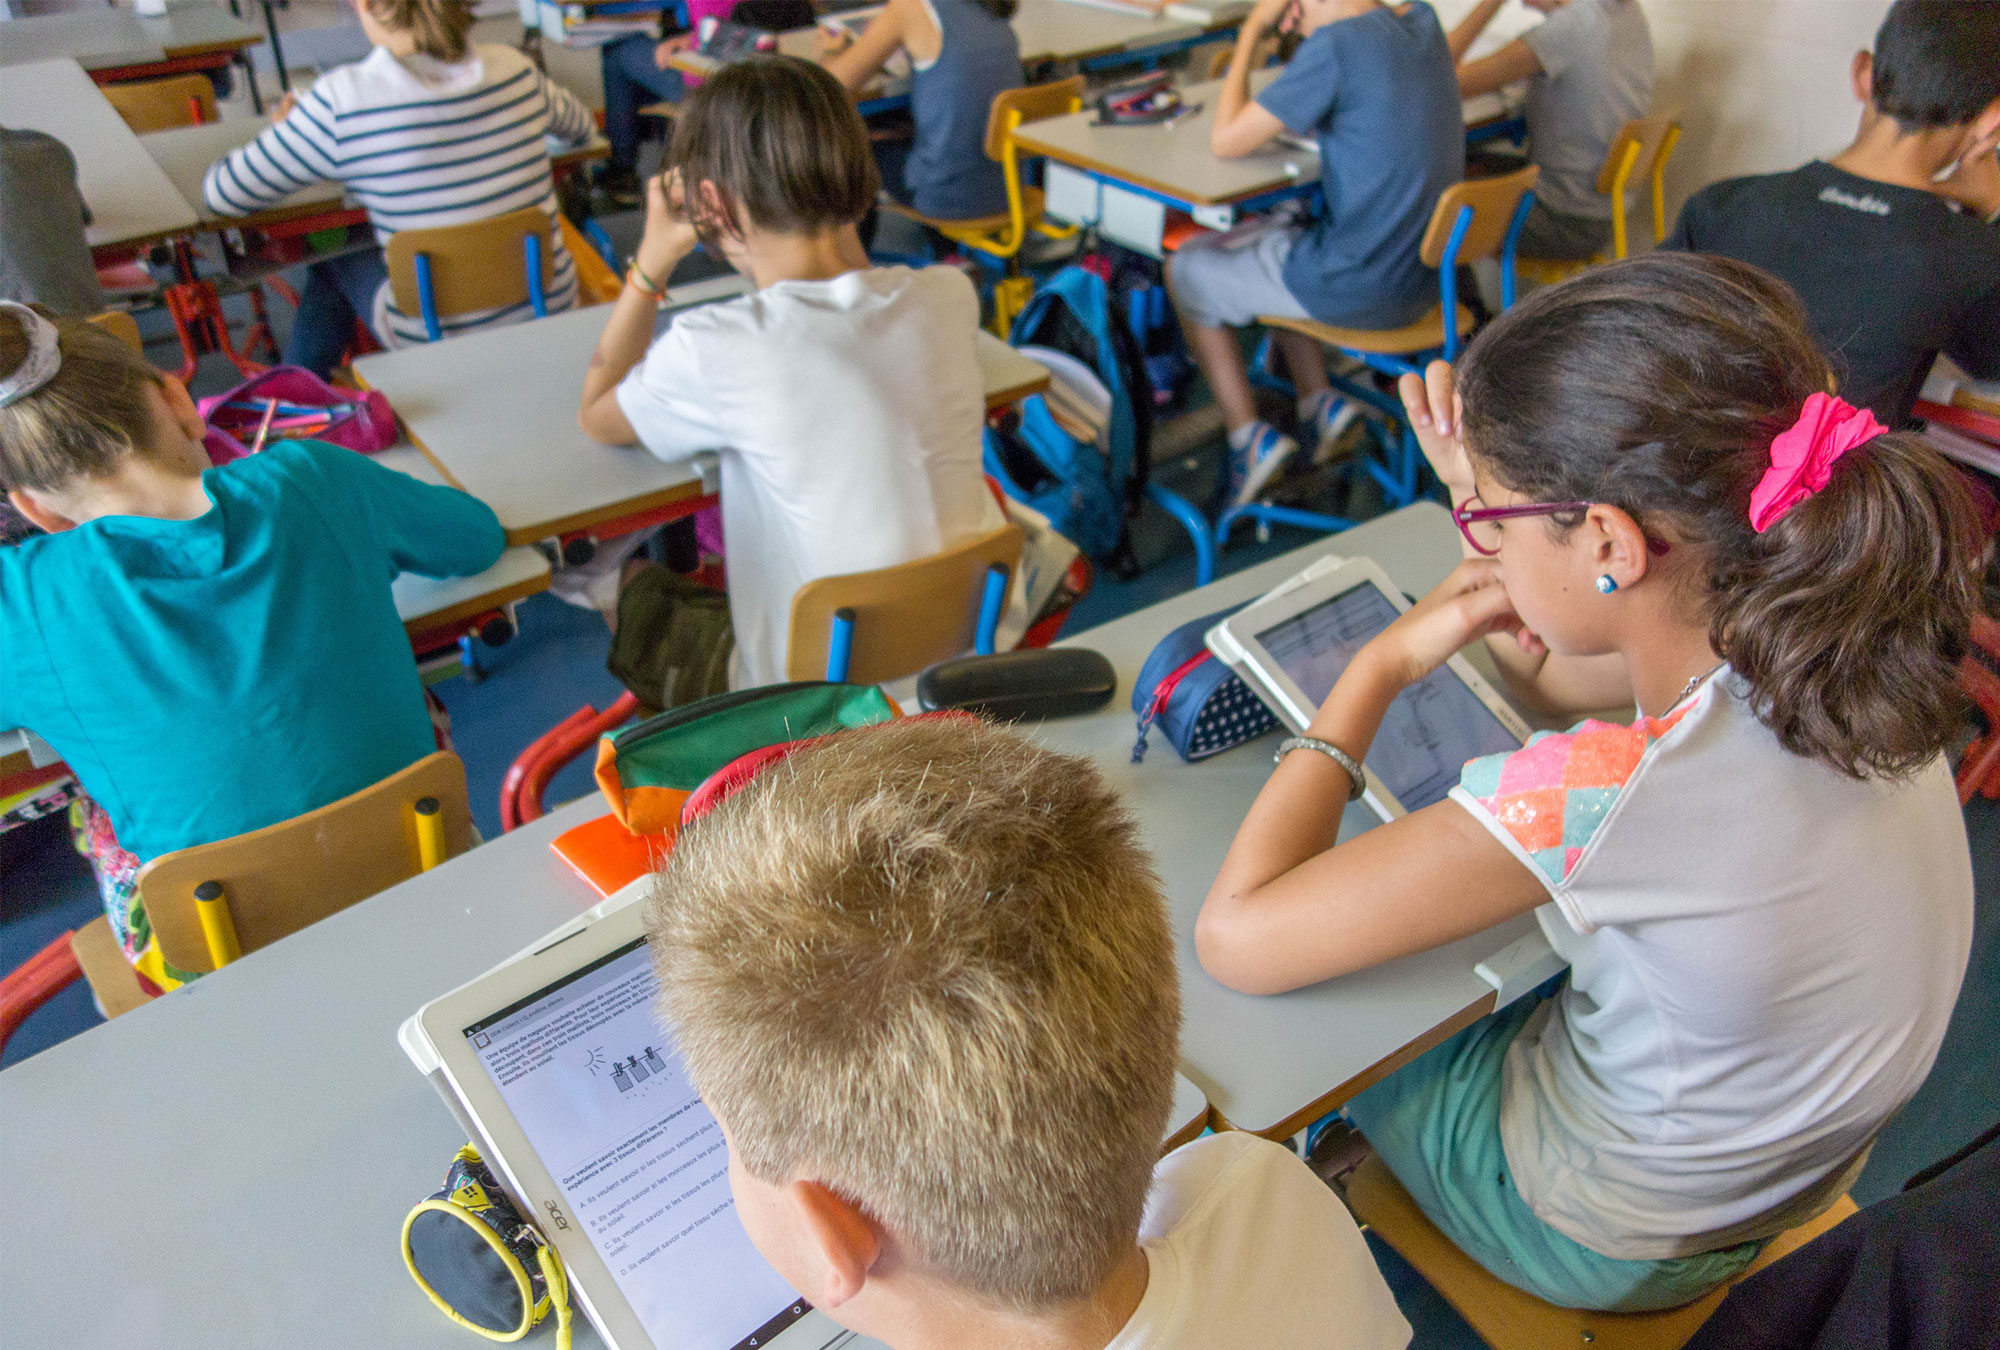 Children sit at desks looking at tablets